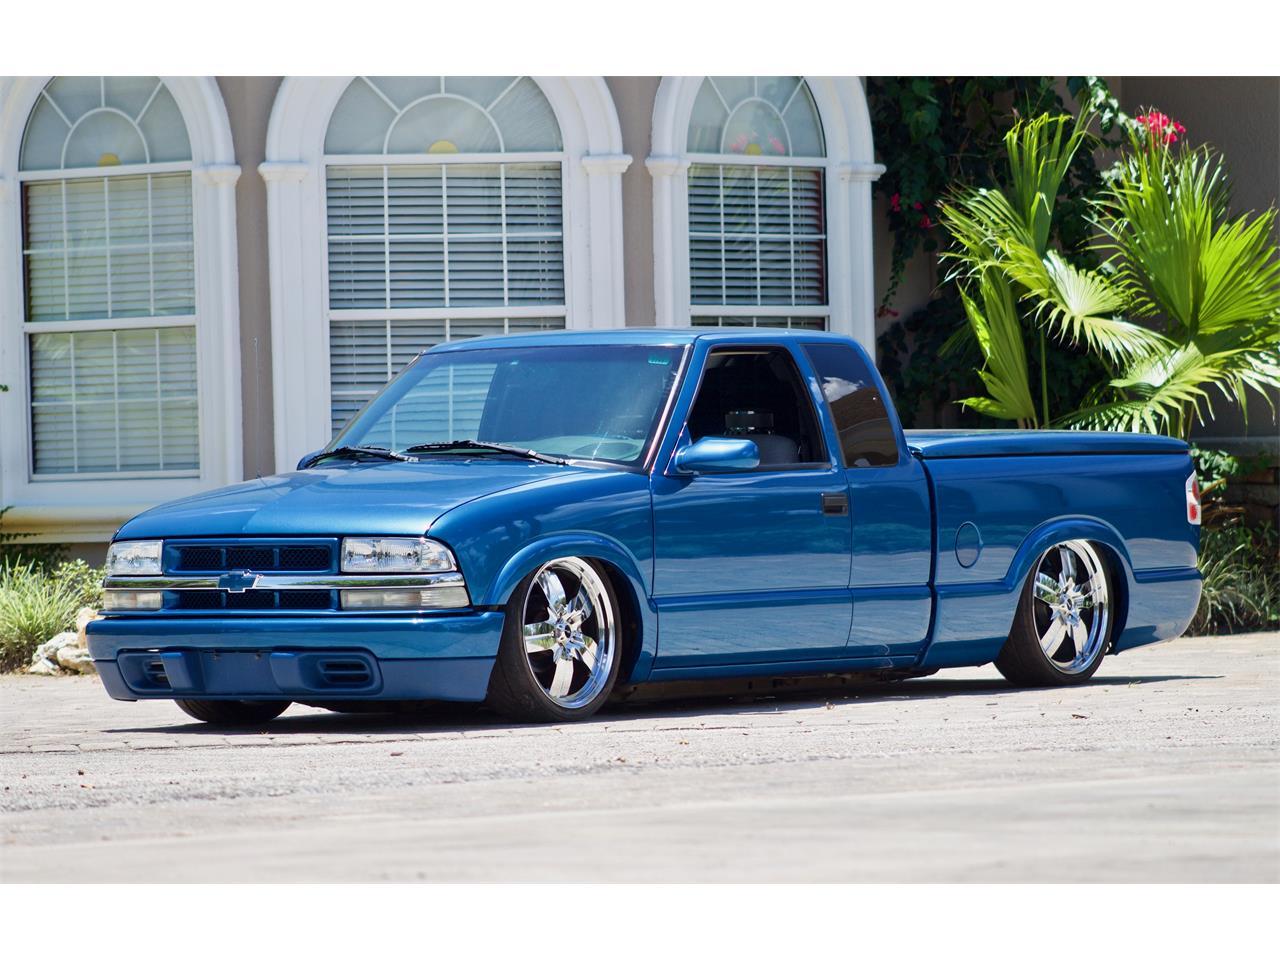 For Sale: 2001 Chevrolet S10 in Eustis, Florida